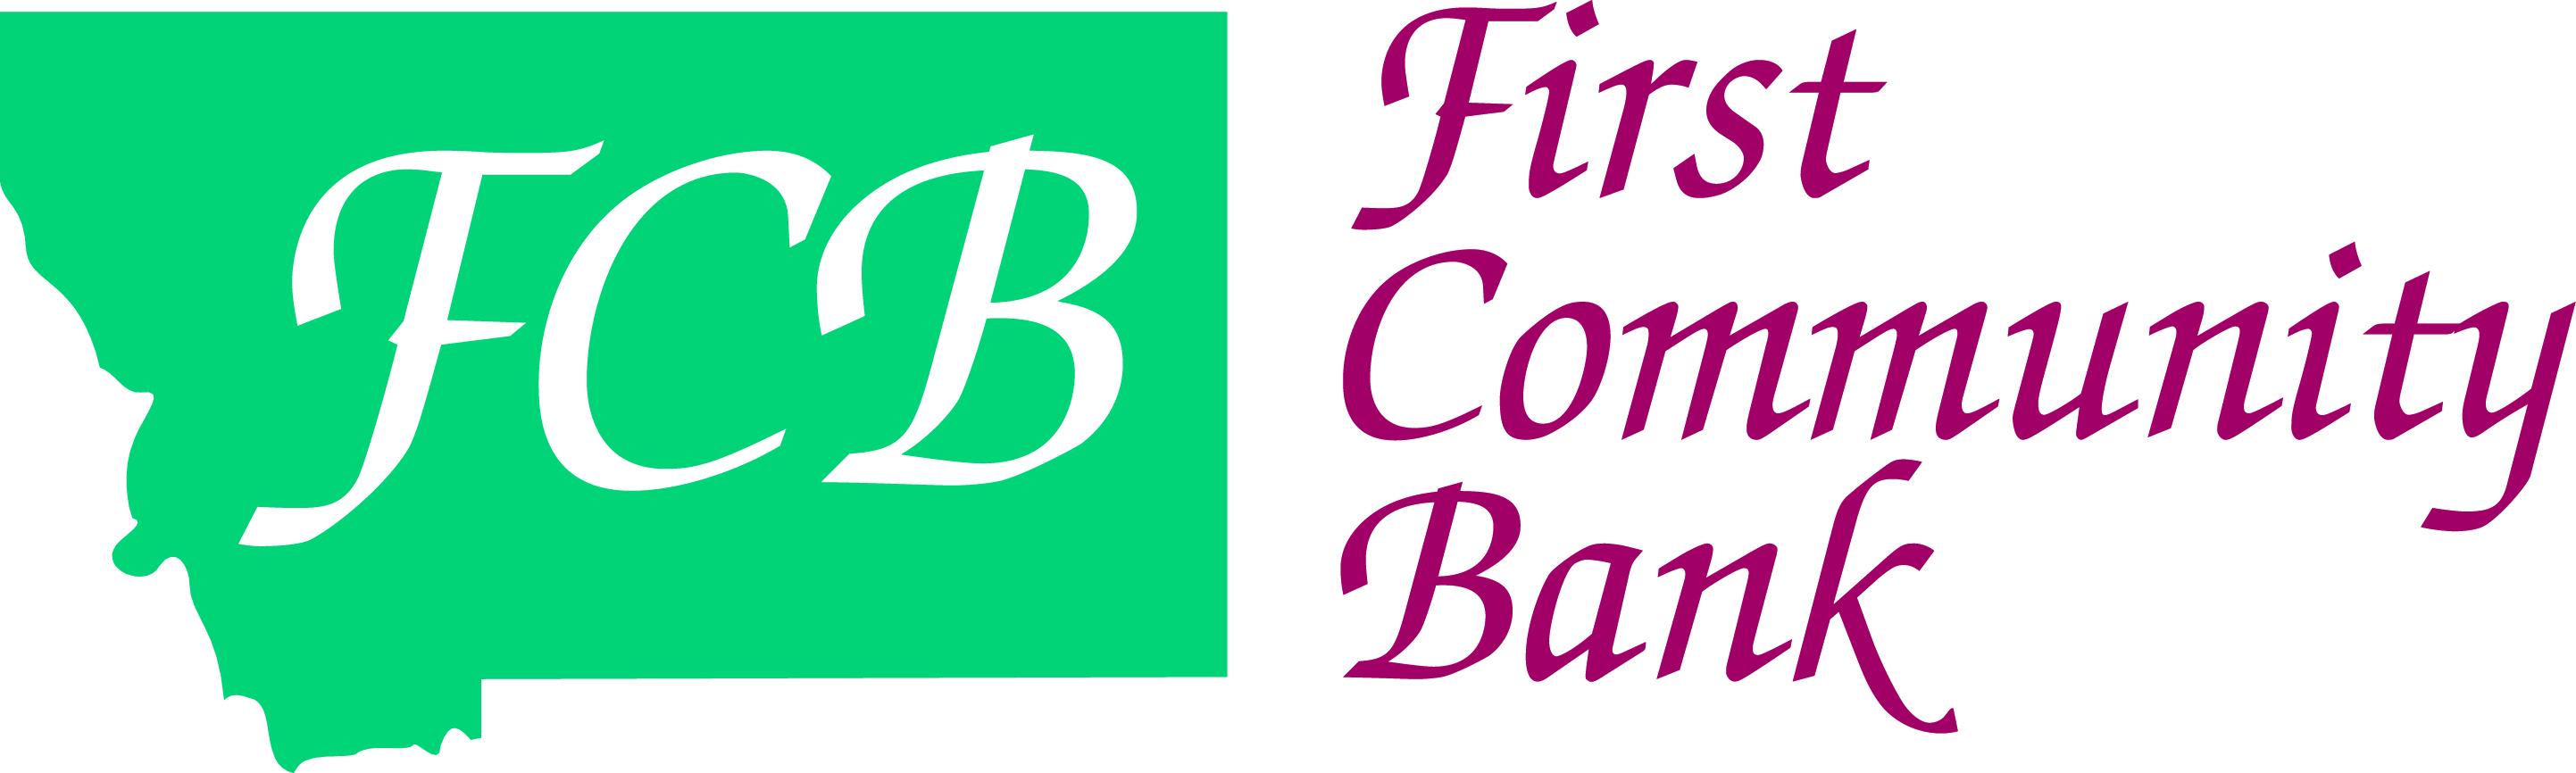 WELCOME BAG SPONSOR - FIRST COMMUNITY BANK - Logo